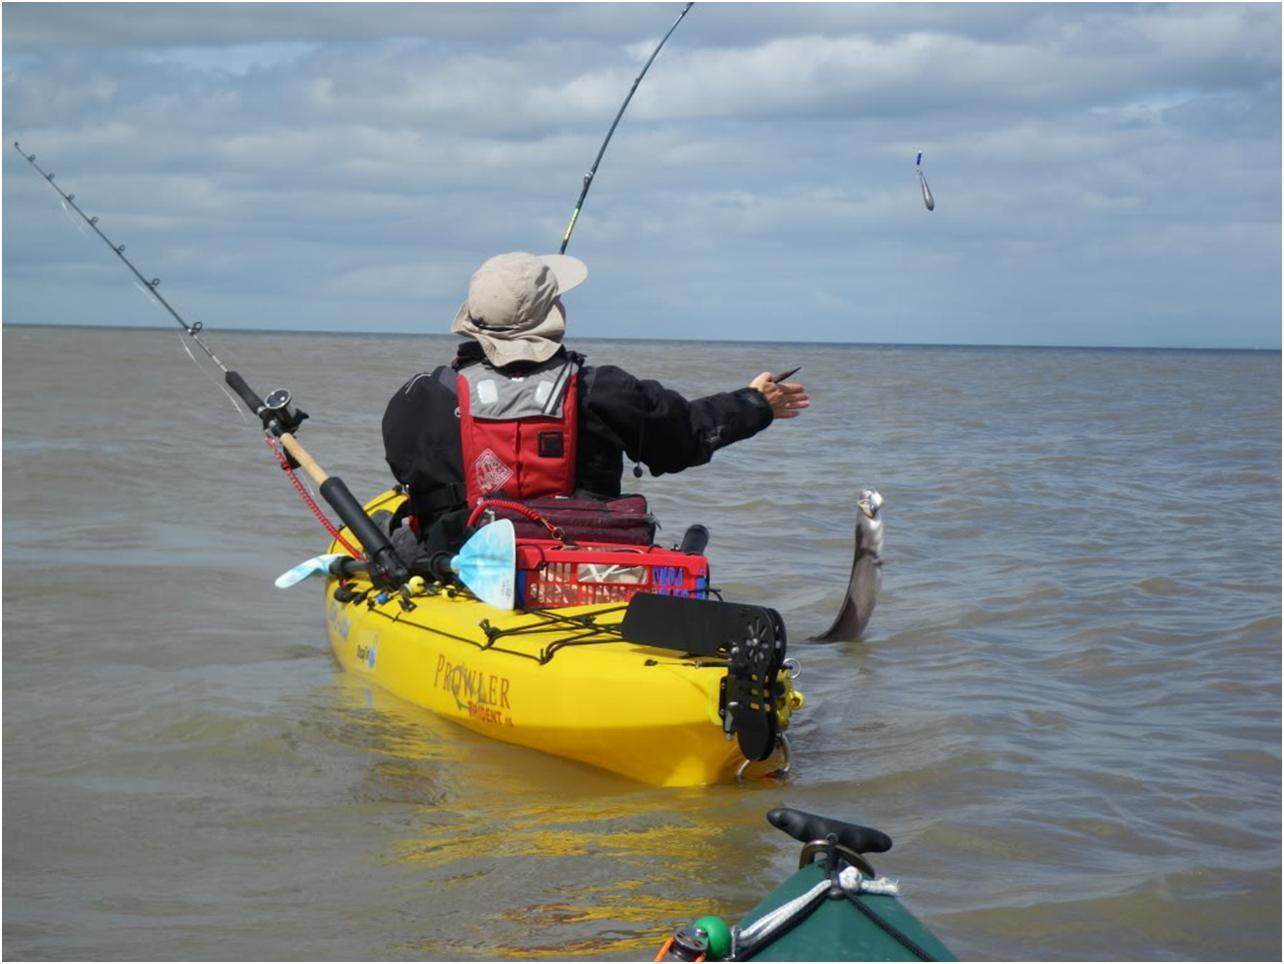 Yak bass at blue anchor dizzyfish kayak fishing for Fishing kayak anchor